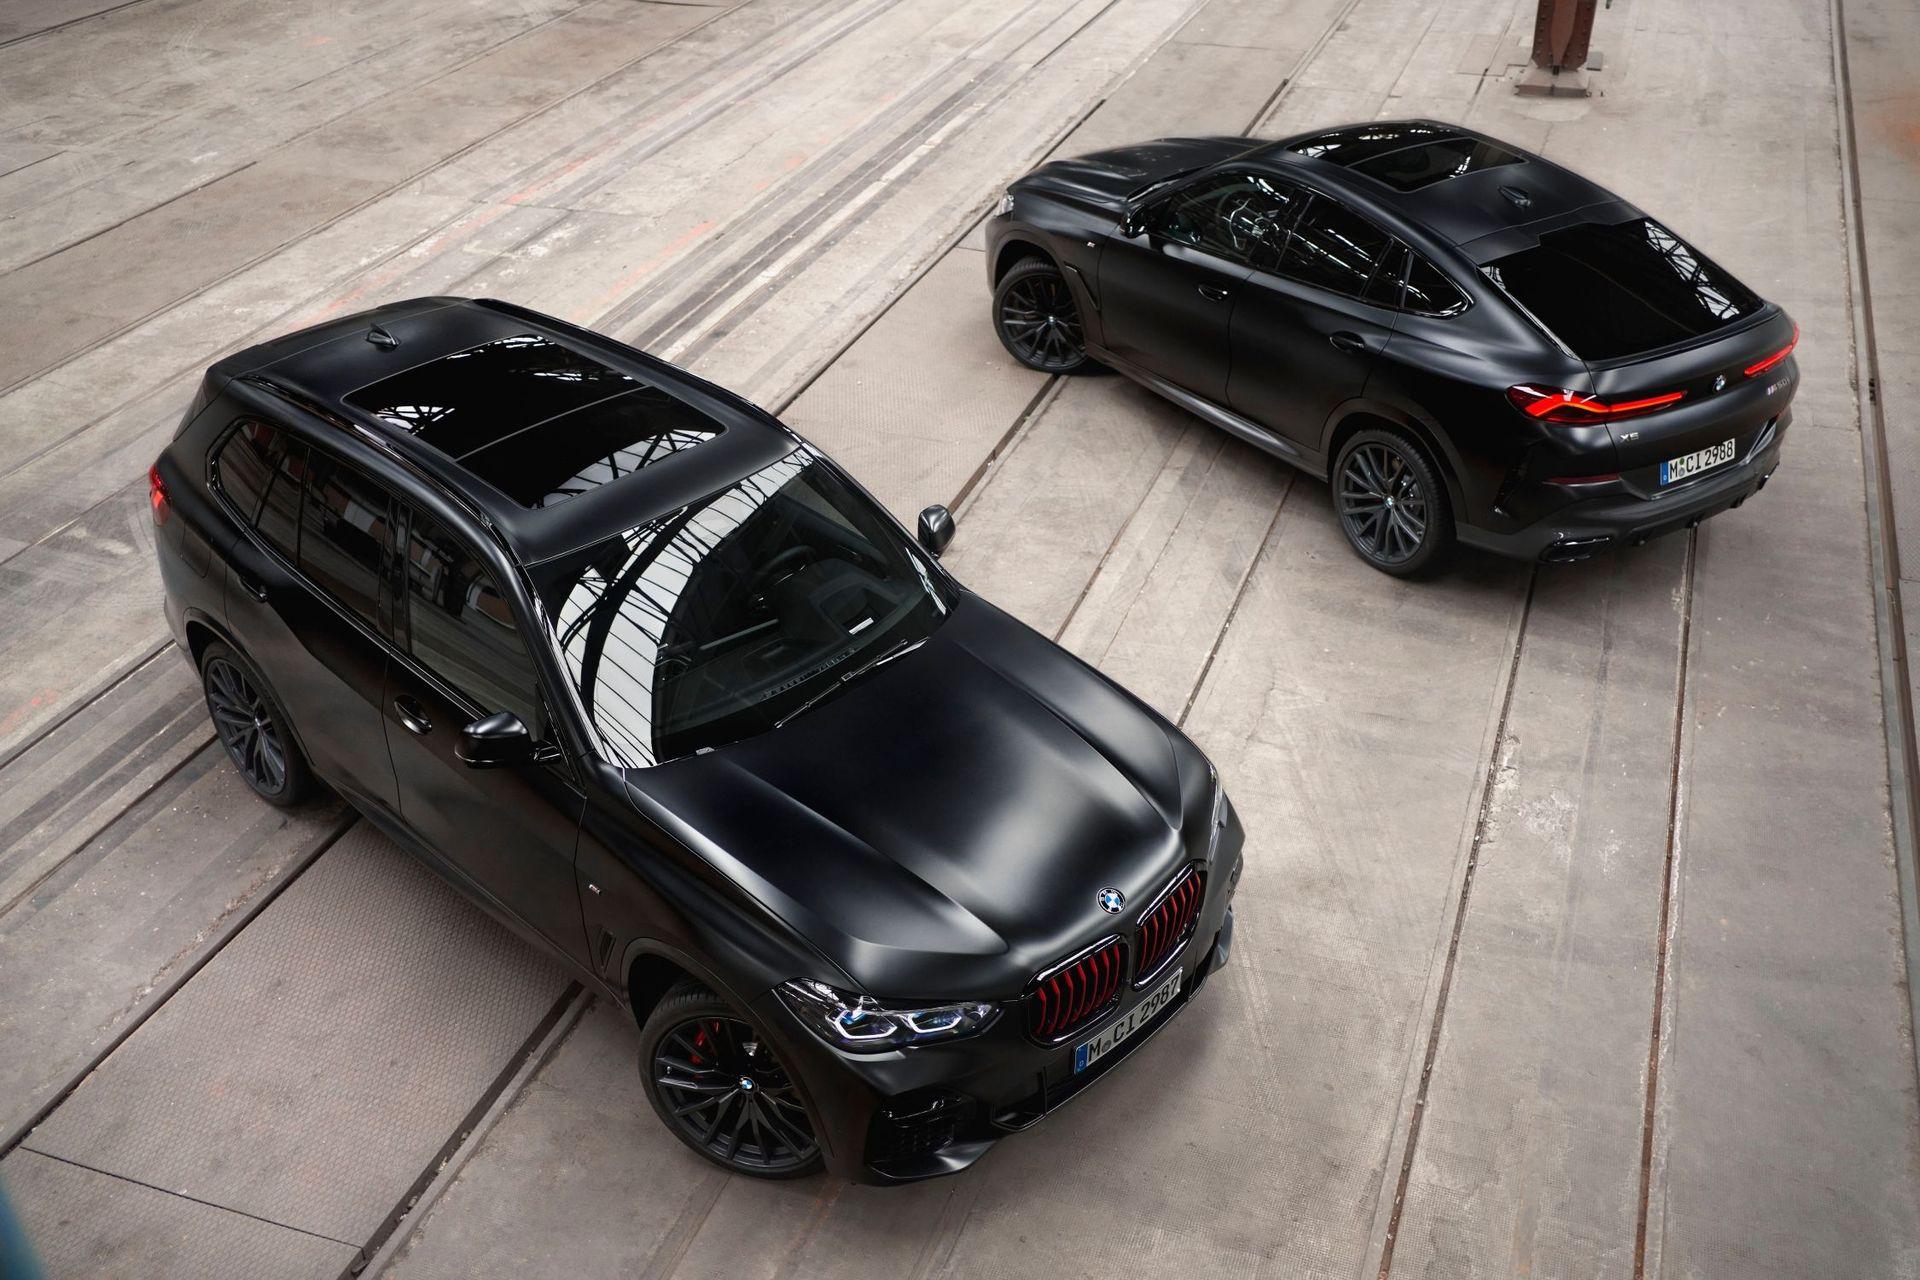 BMW släpper frostsvarta versionen av X5/X6/X7